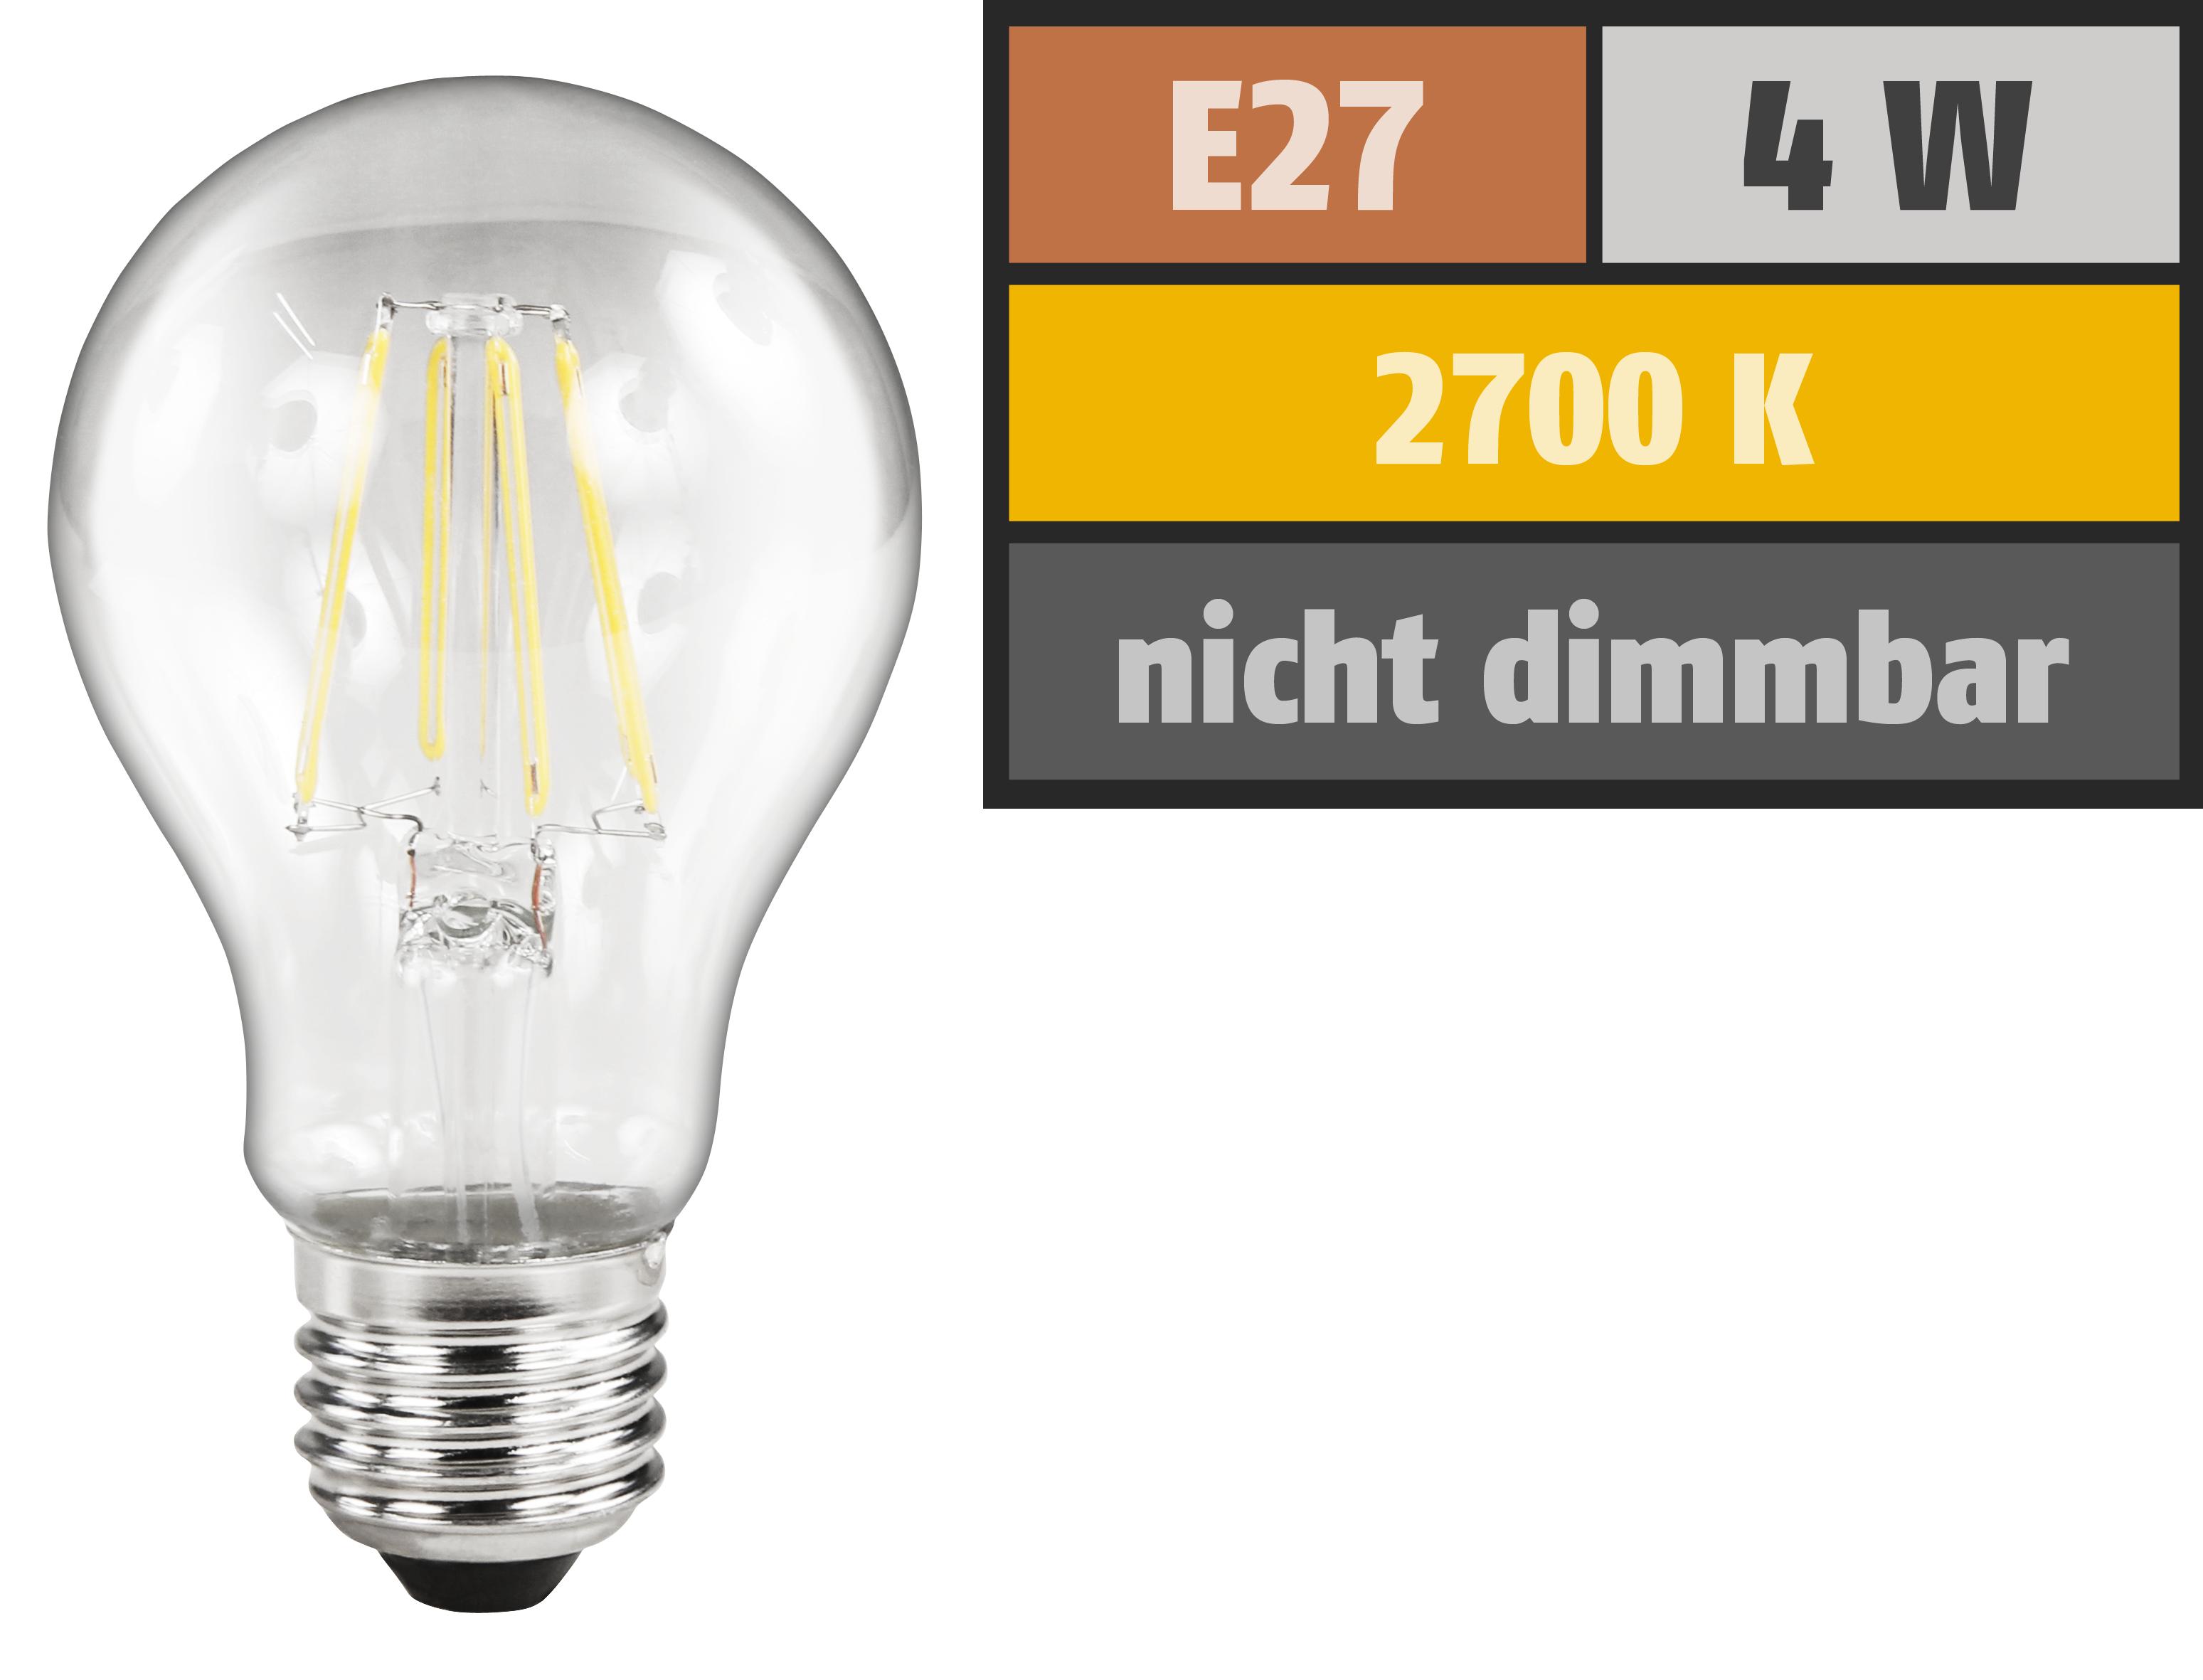 LED Filament Glühlampe McShine ''Filed'', E27, 4W, 470lm, warmweiß, klar